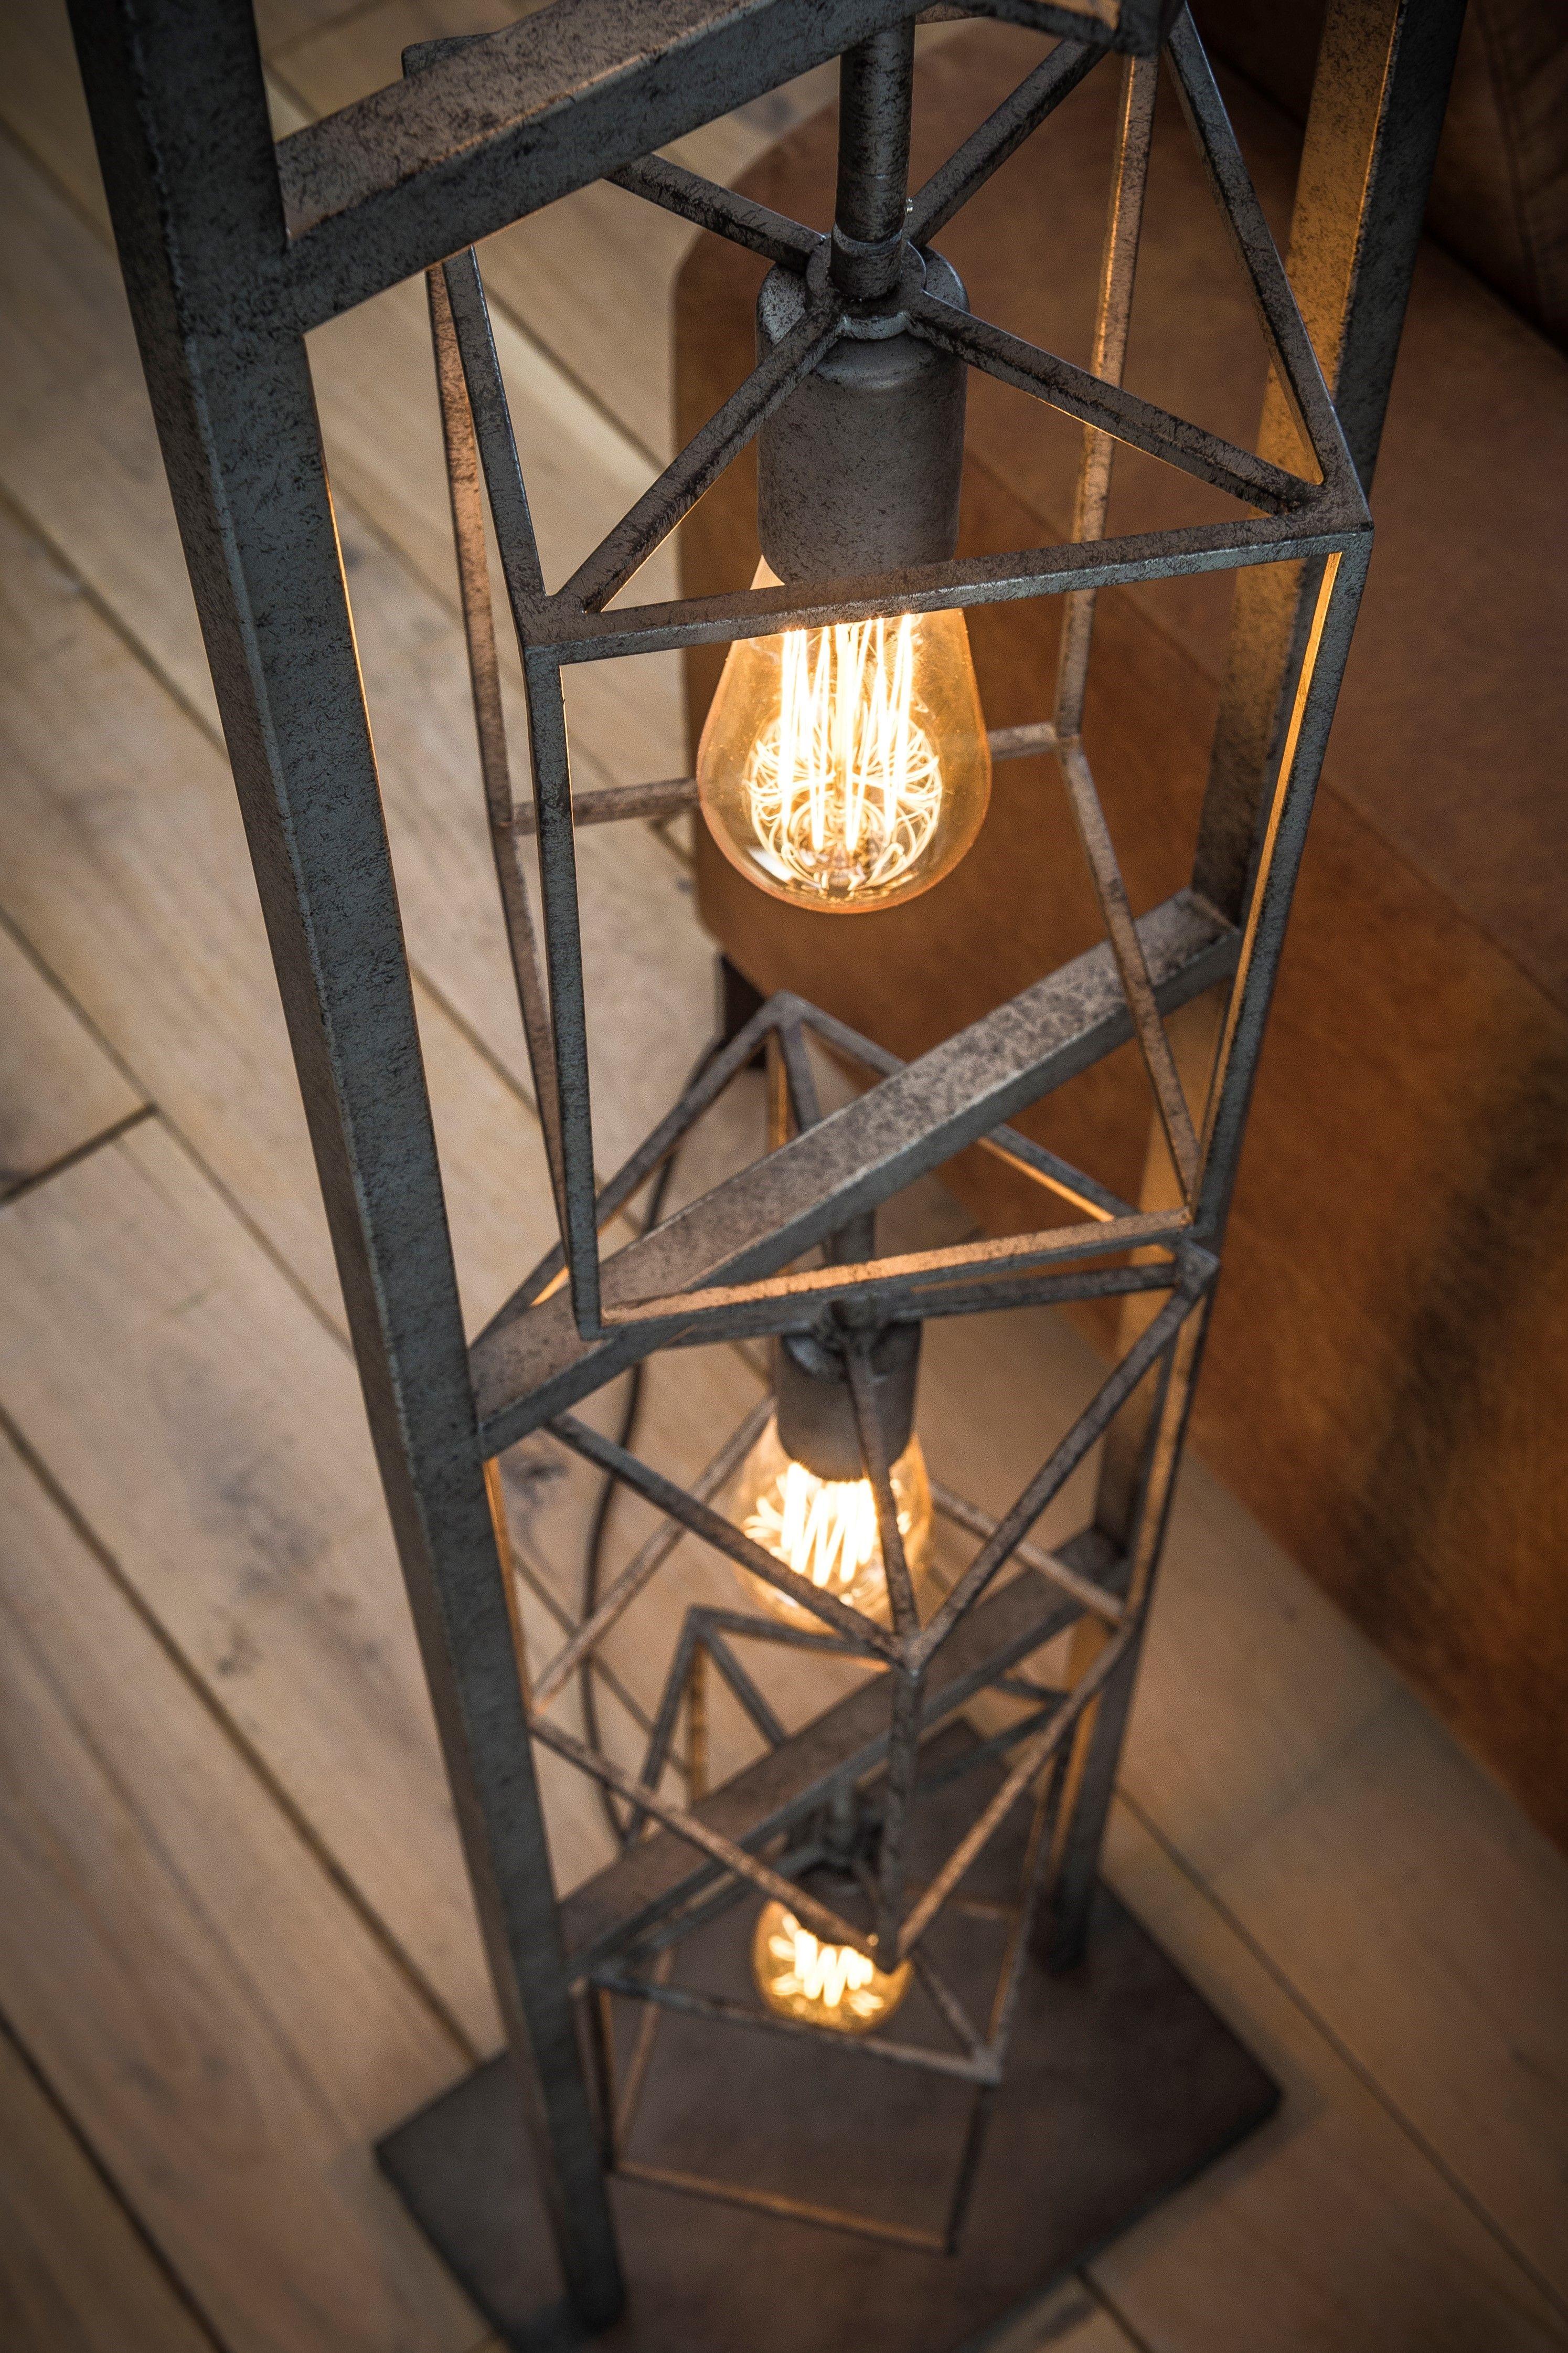 Stehlampe Kube | Stehlampe, Lampe, Industrie stil lampen